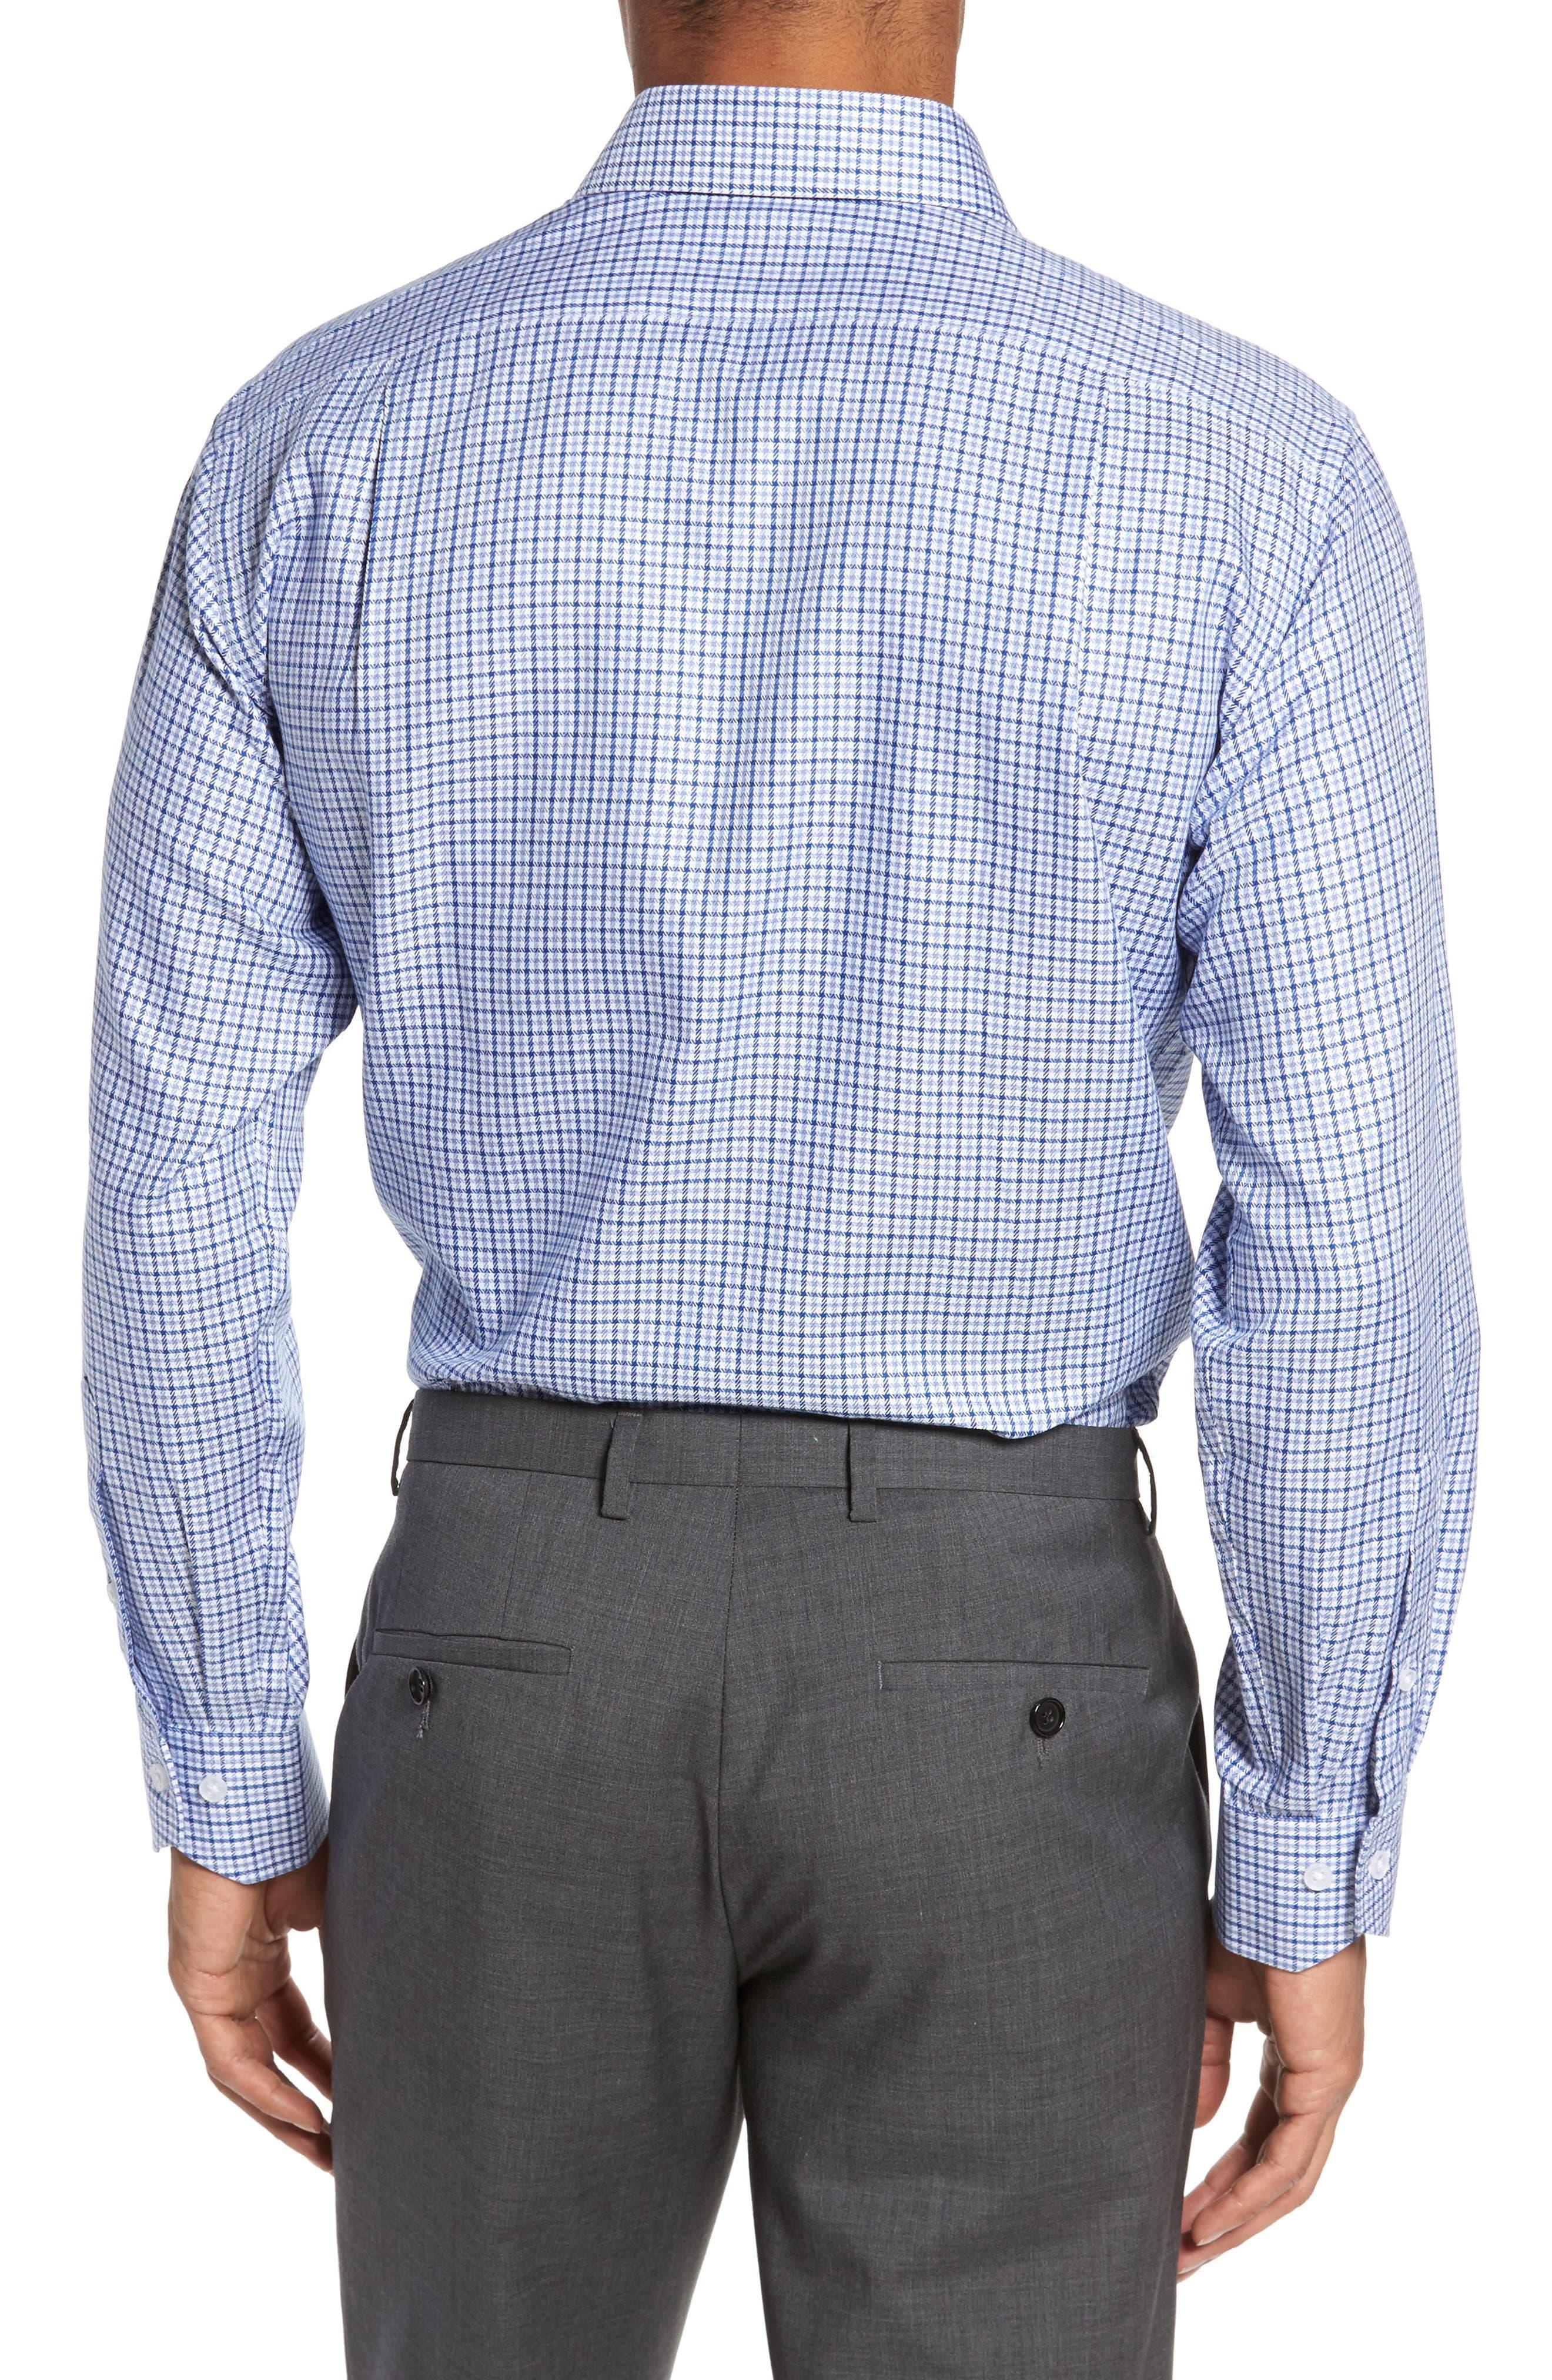 LORENZO UOMO,                             Trim Fit Textured Check Dress Shirt,                             Alternate thumbnail 2, color,                             410